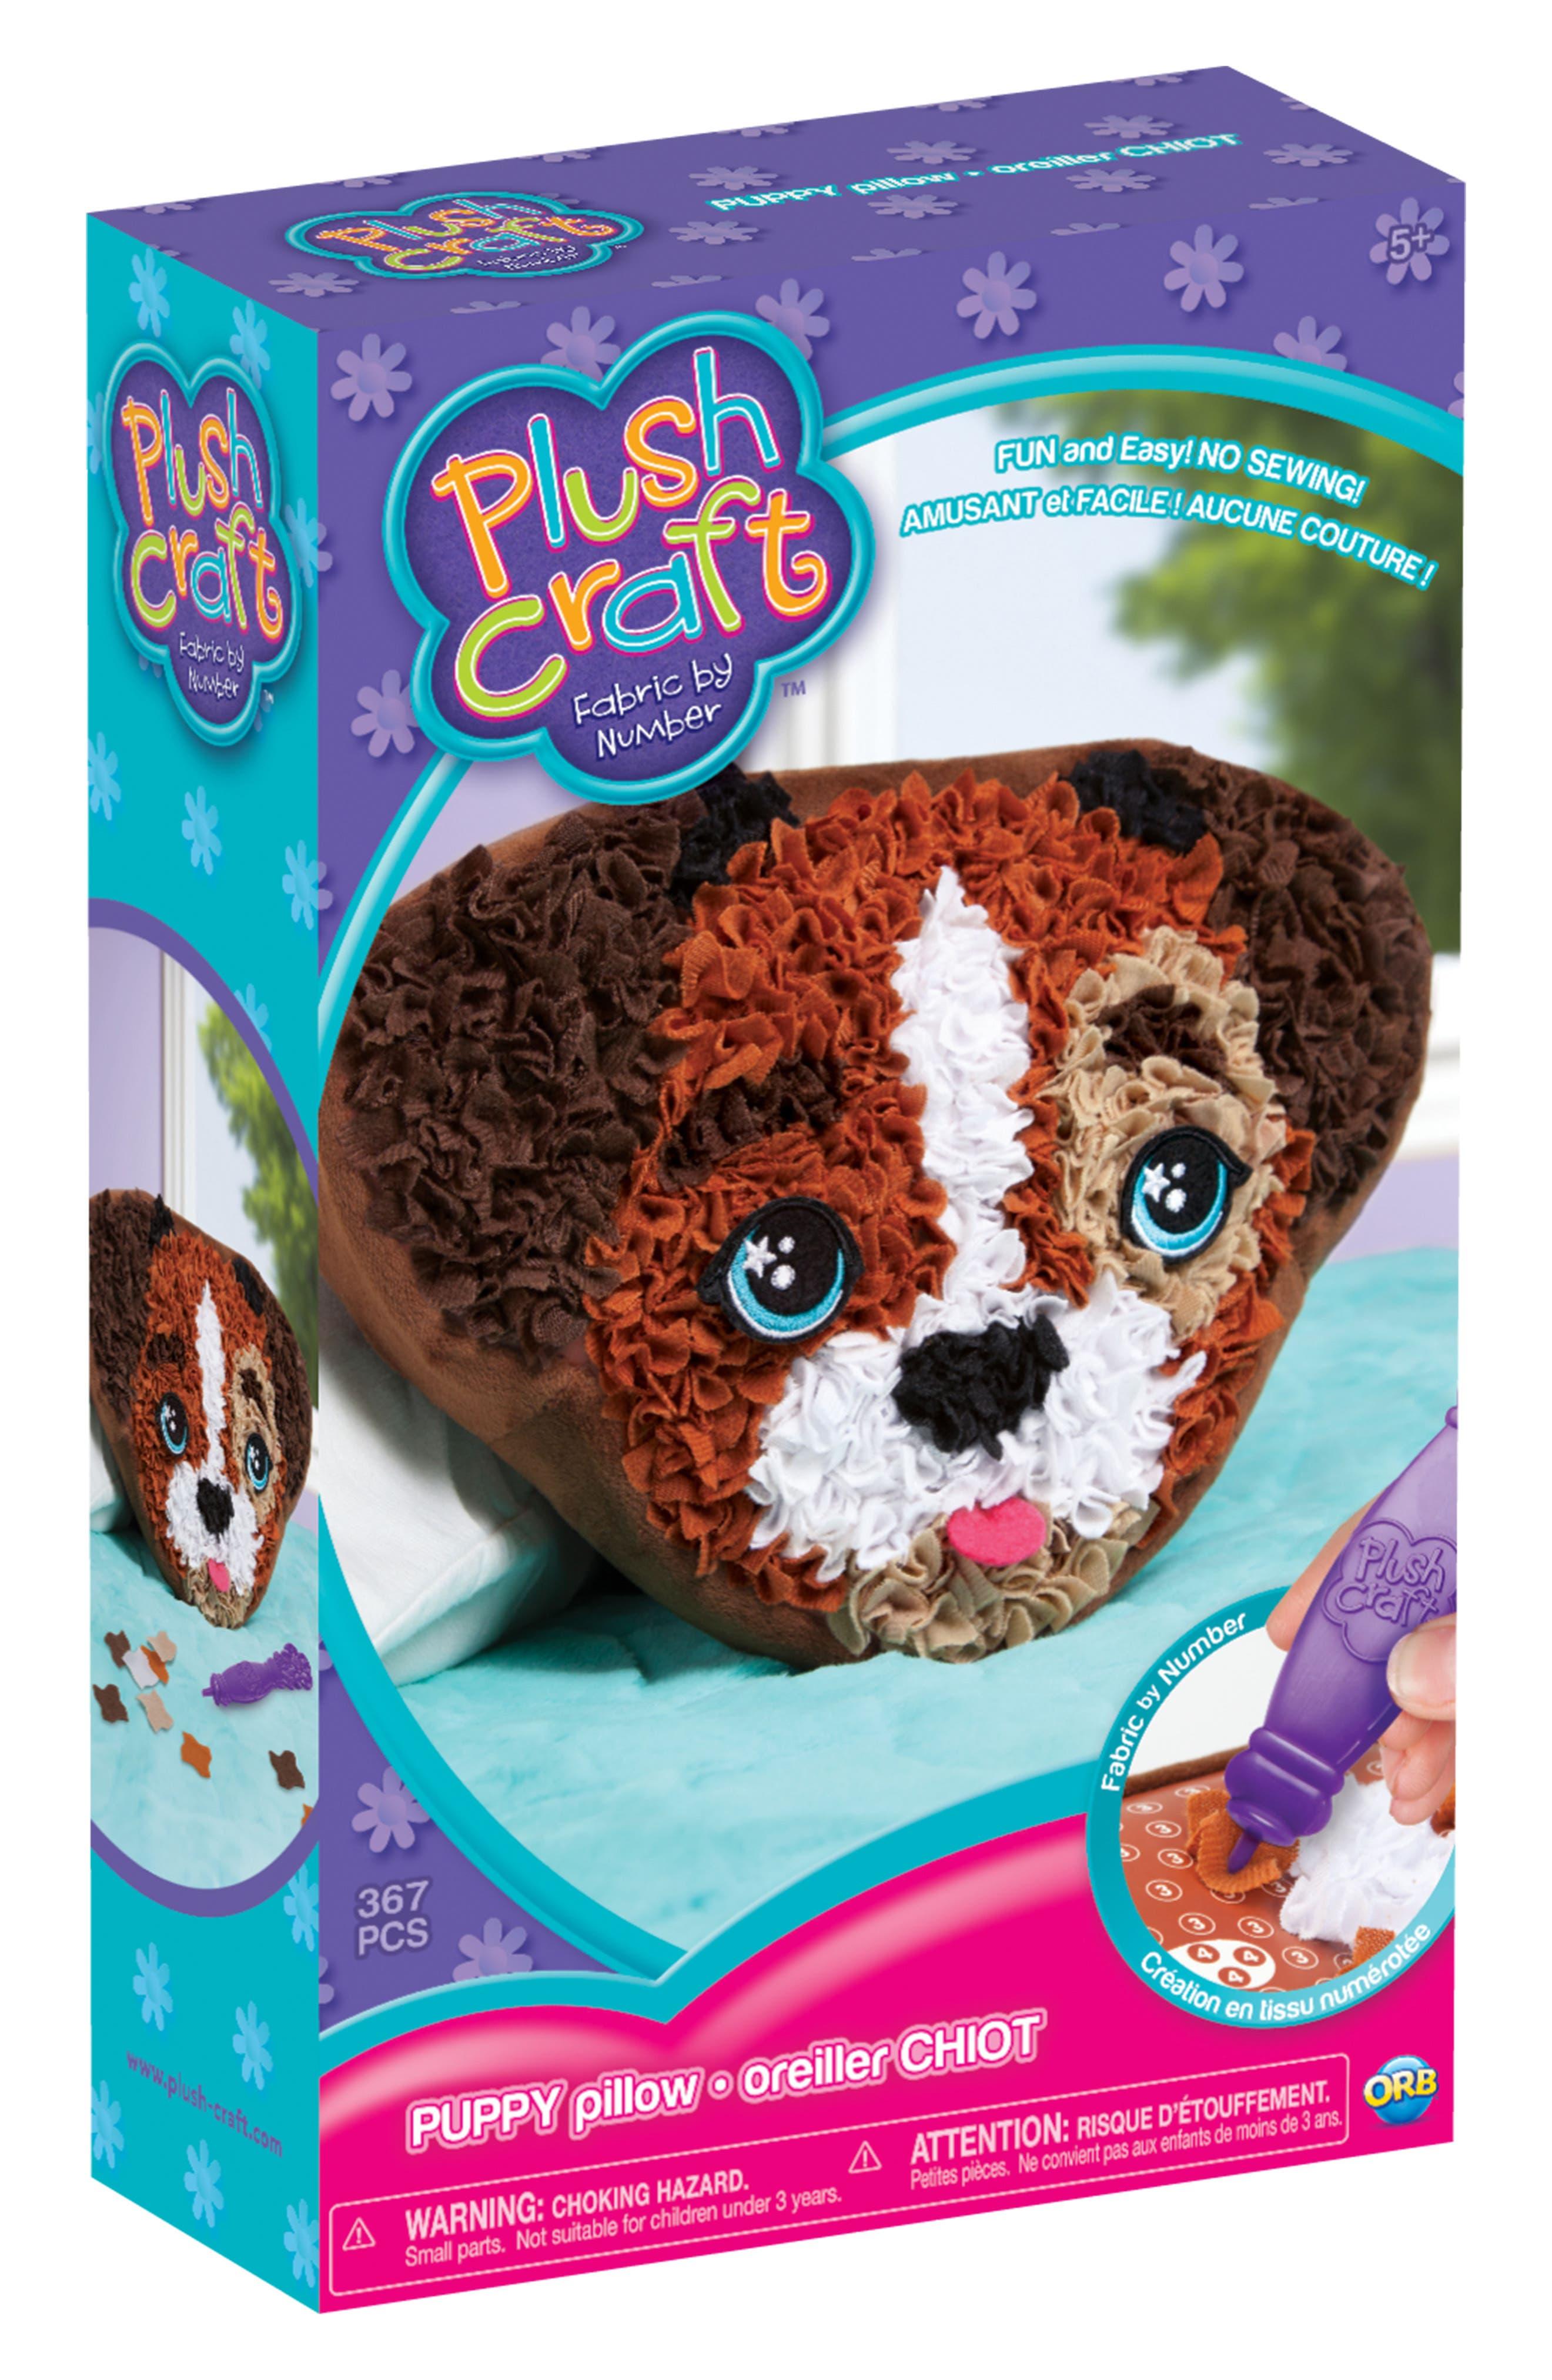 PlushCraft Puppy Pillow Craft Kit,                             Main thumbnail 1, color,                             200